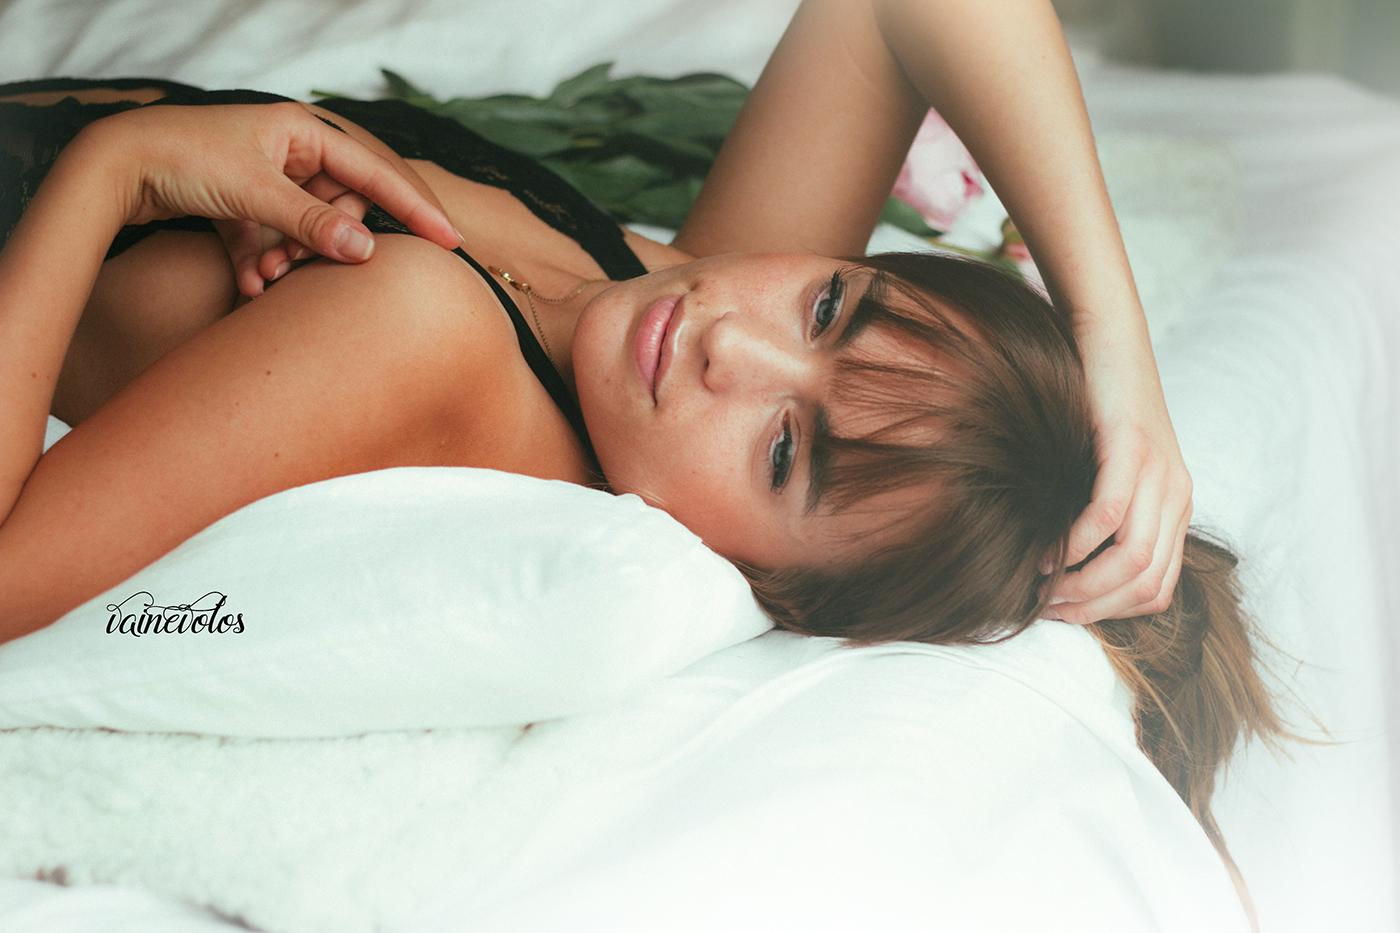 erotik leipzig de latexsex